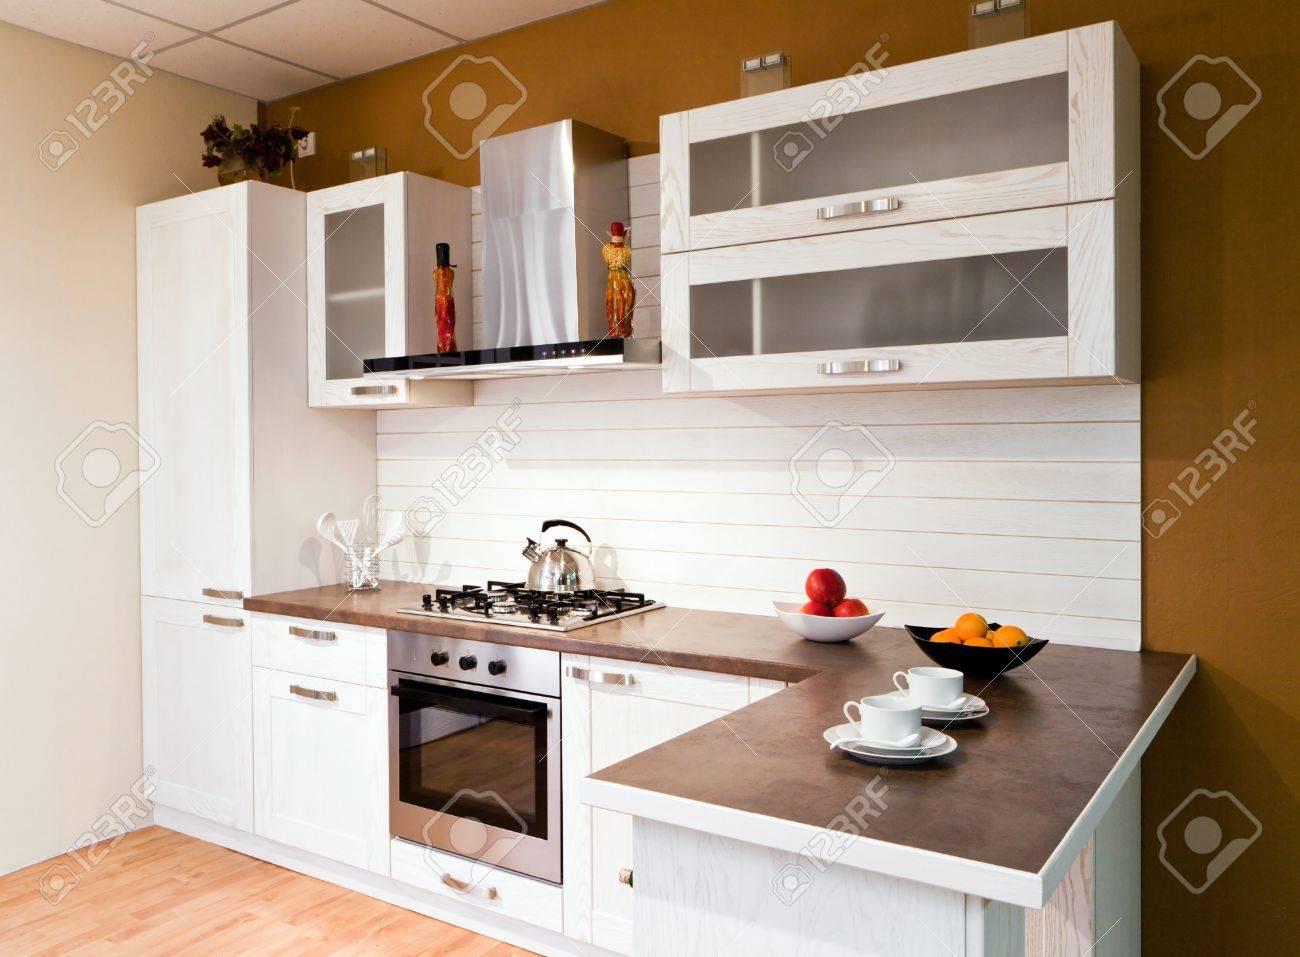 Tende Per Interni Cucina | Tende Per Interni Cucina